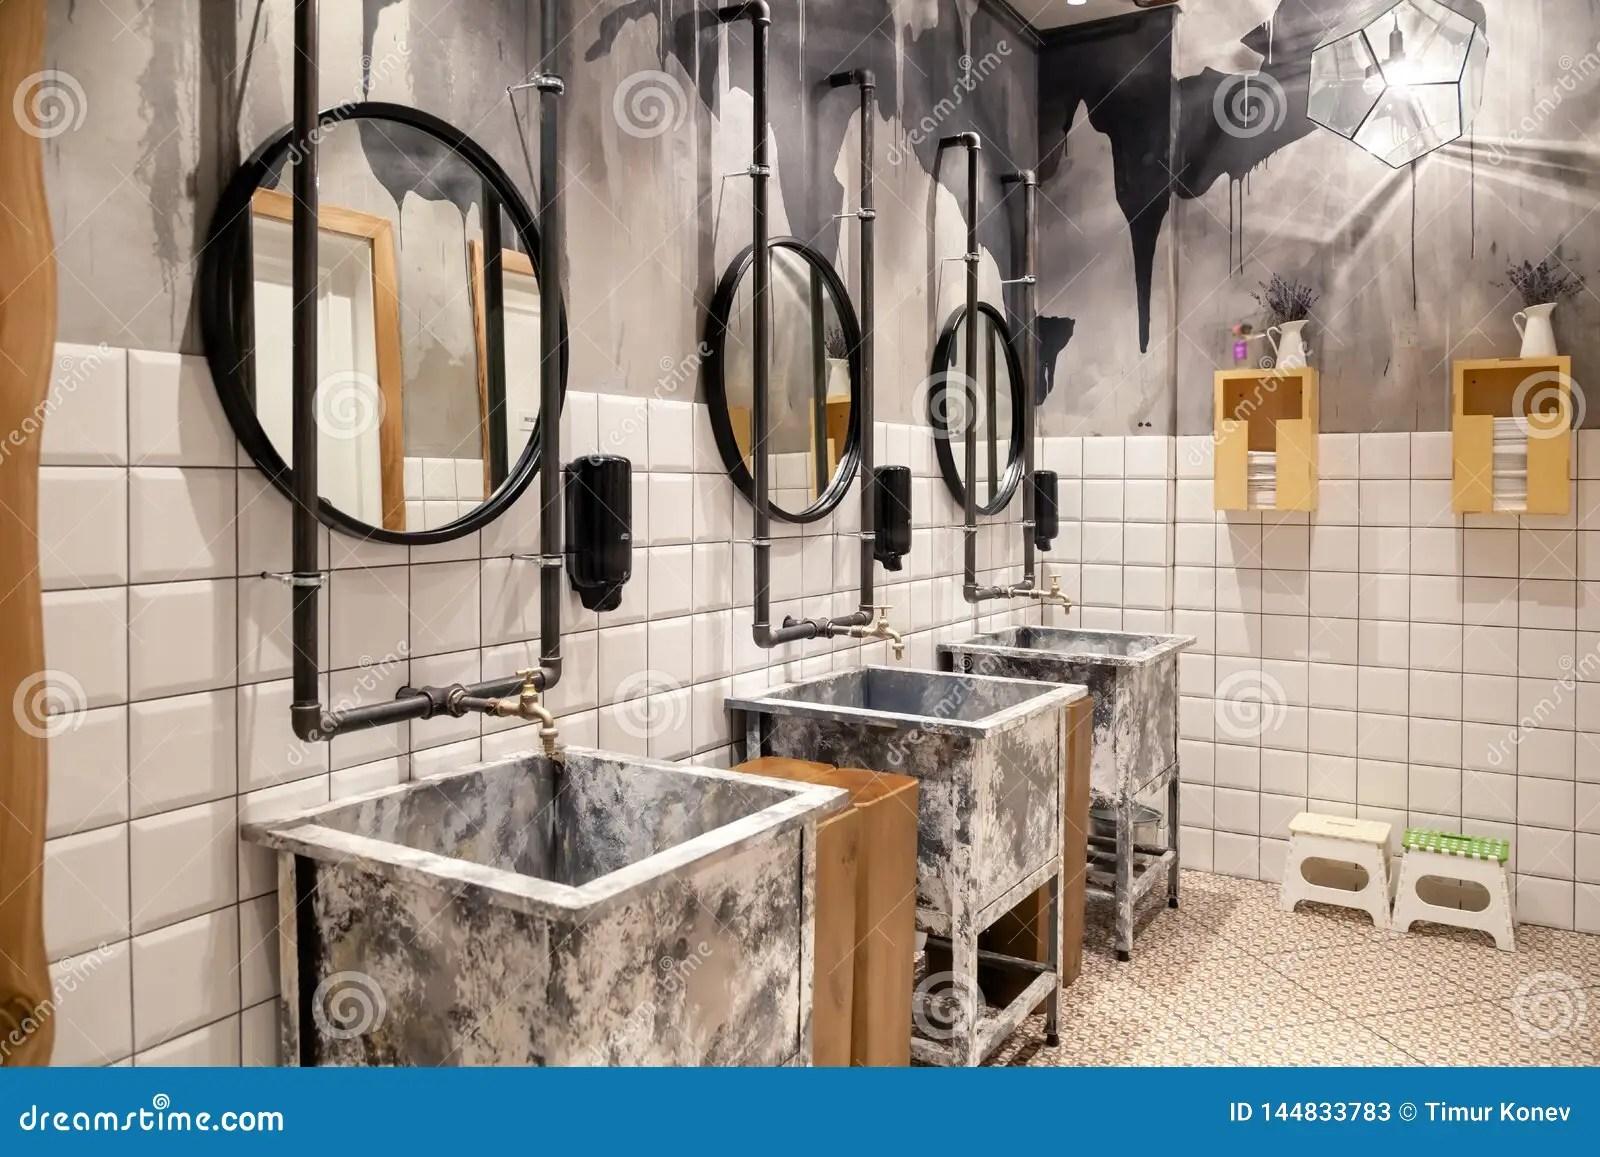 https www dreamstime com russia novosibirsk modern interior restaurant loft style toilet square concrete sinks copper faucet black russia novosibirsk image144833783